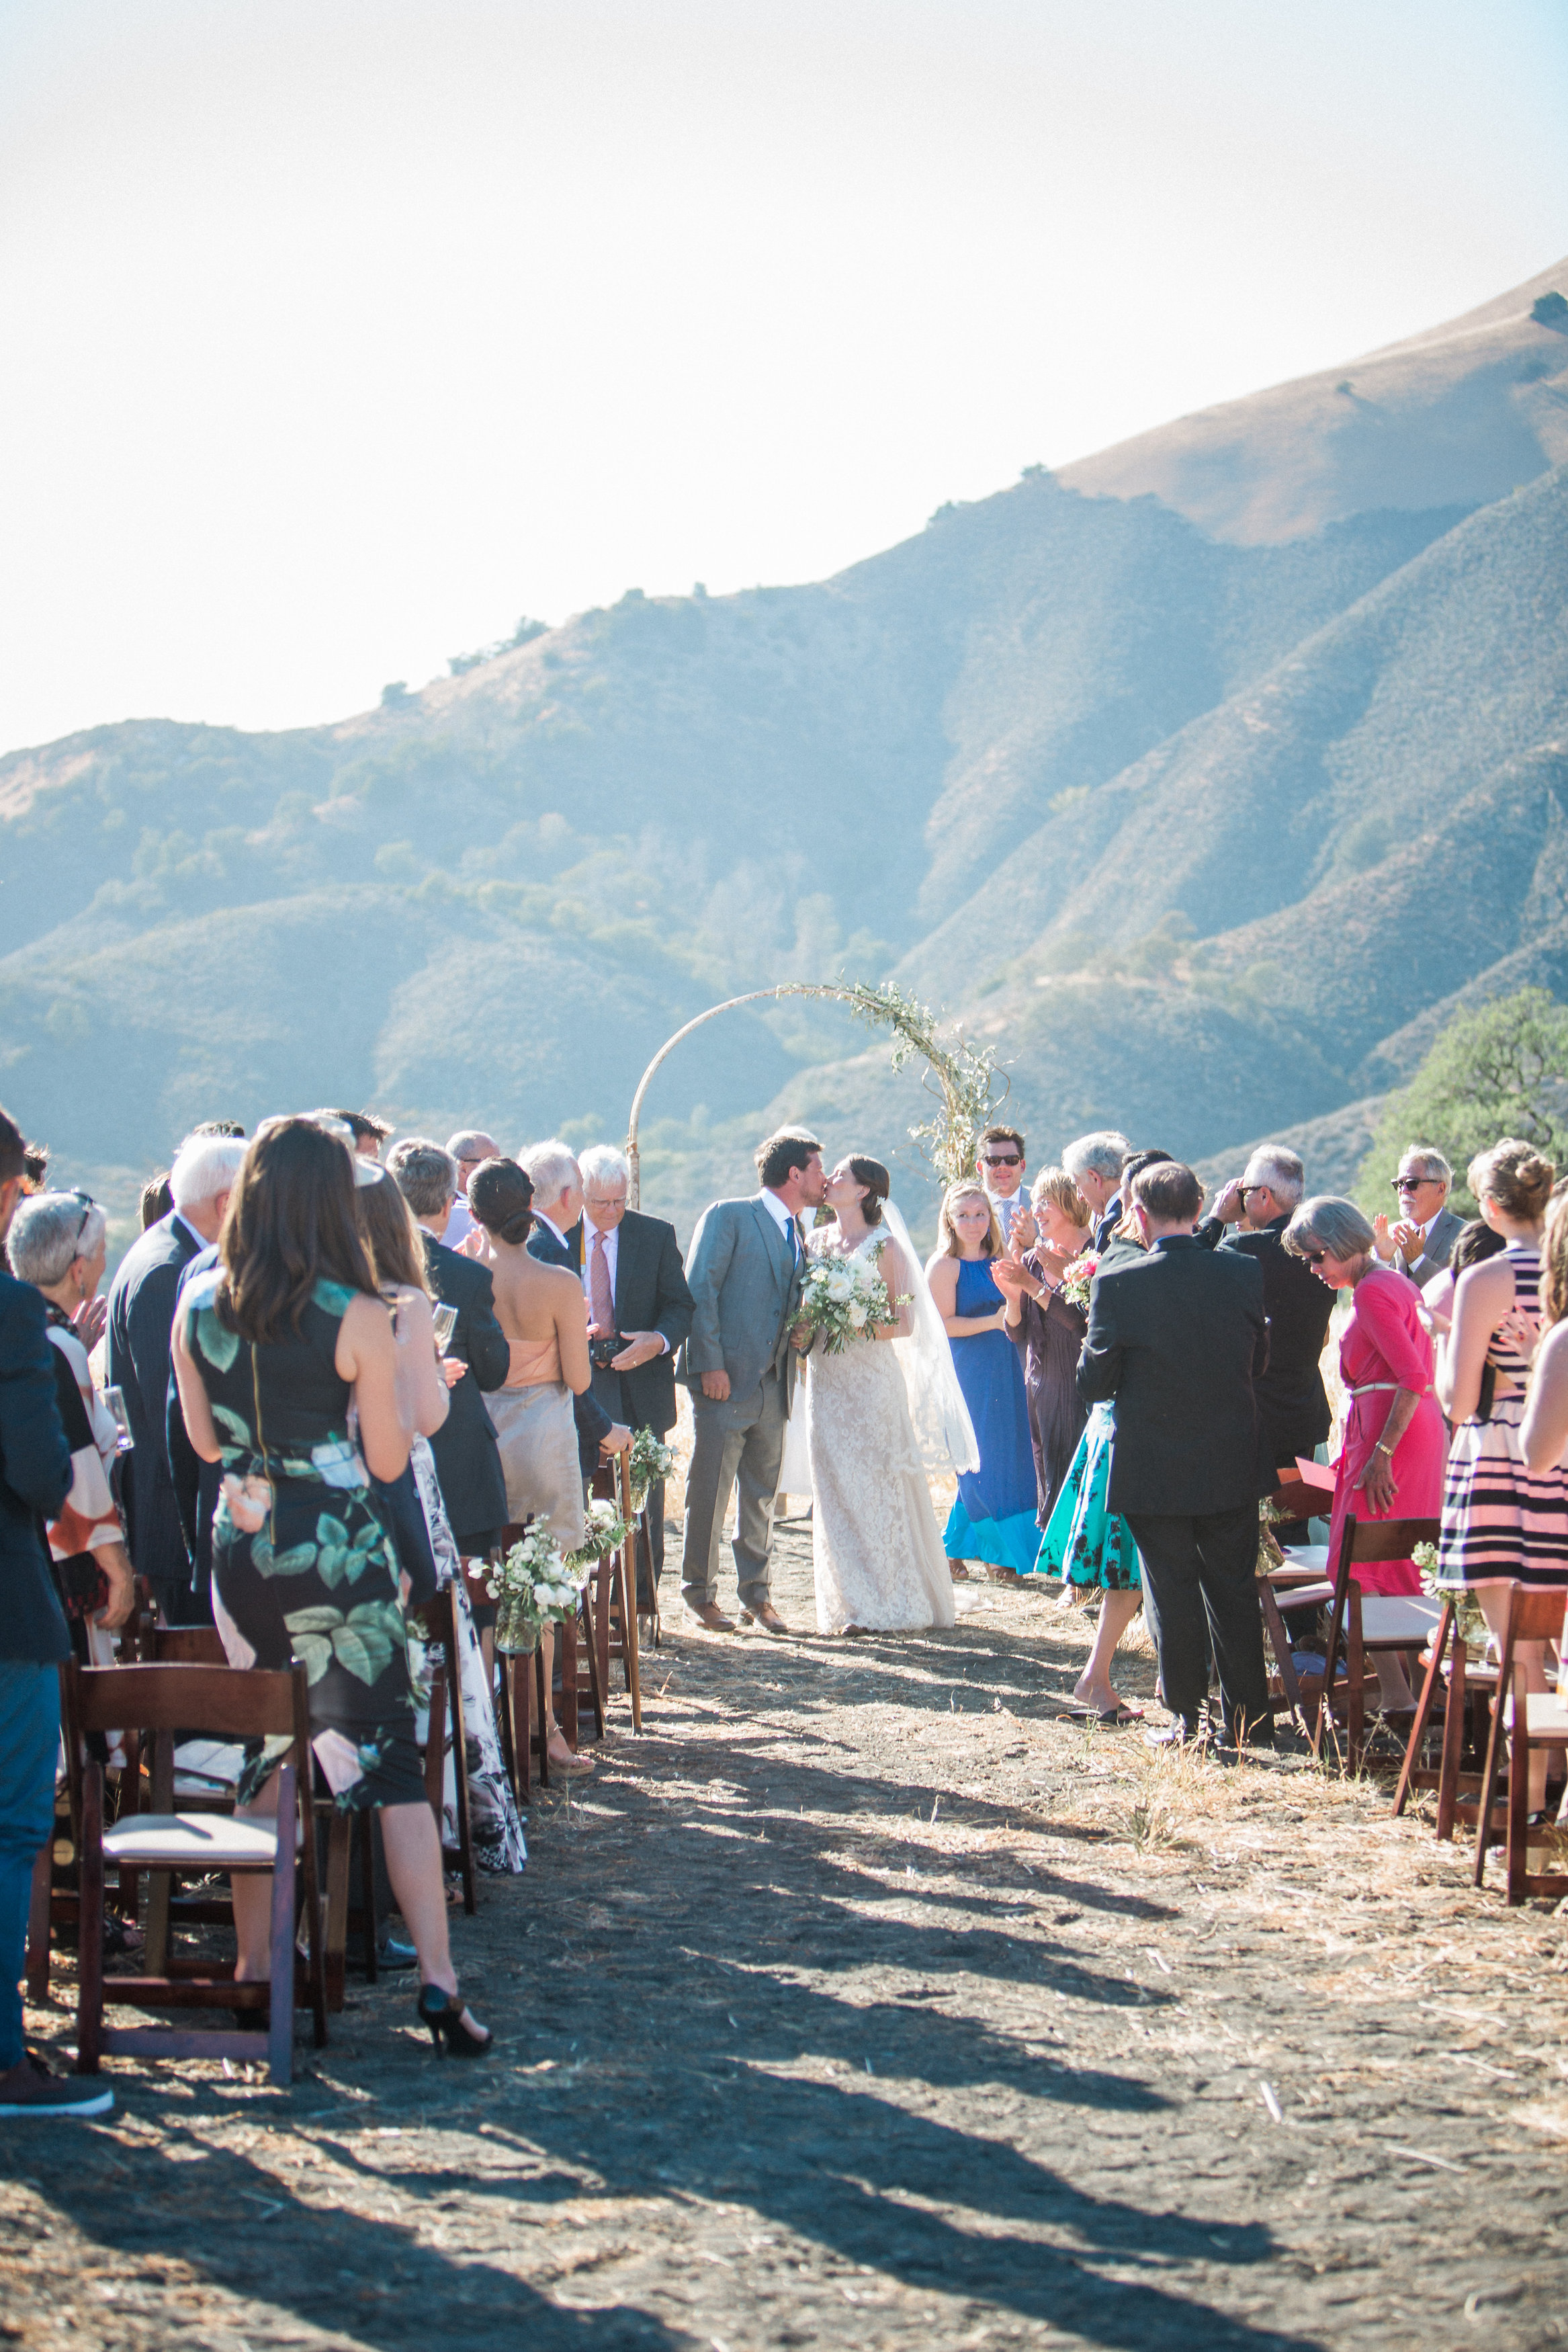 santabarbarawedding.com   photo: Kiel Rucker   Mountaintop Wedding Location Santa Ynez